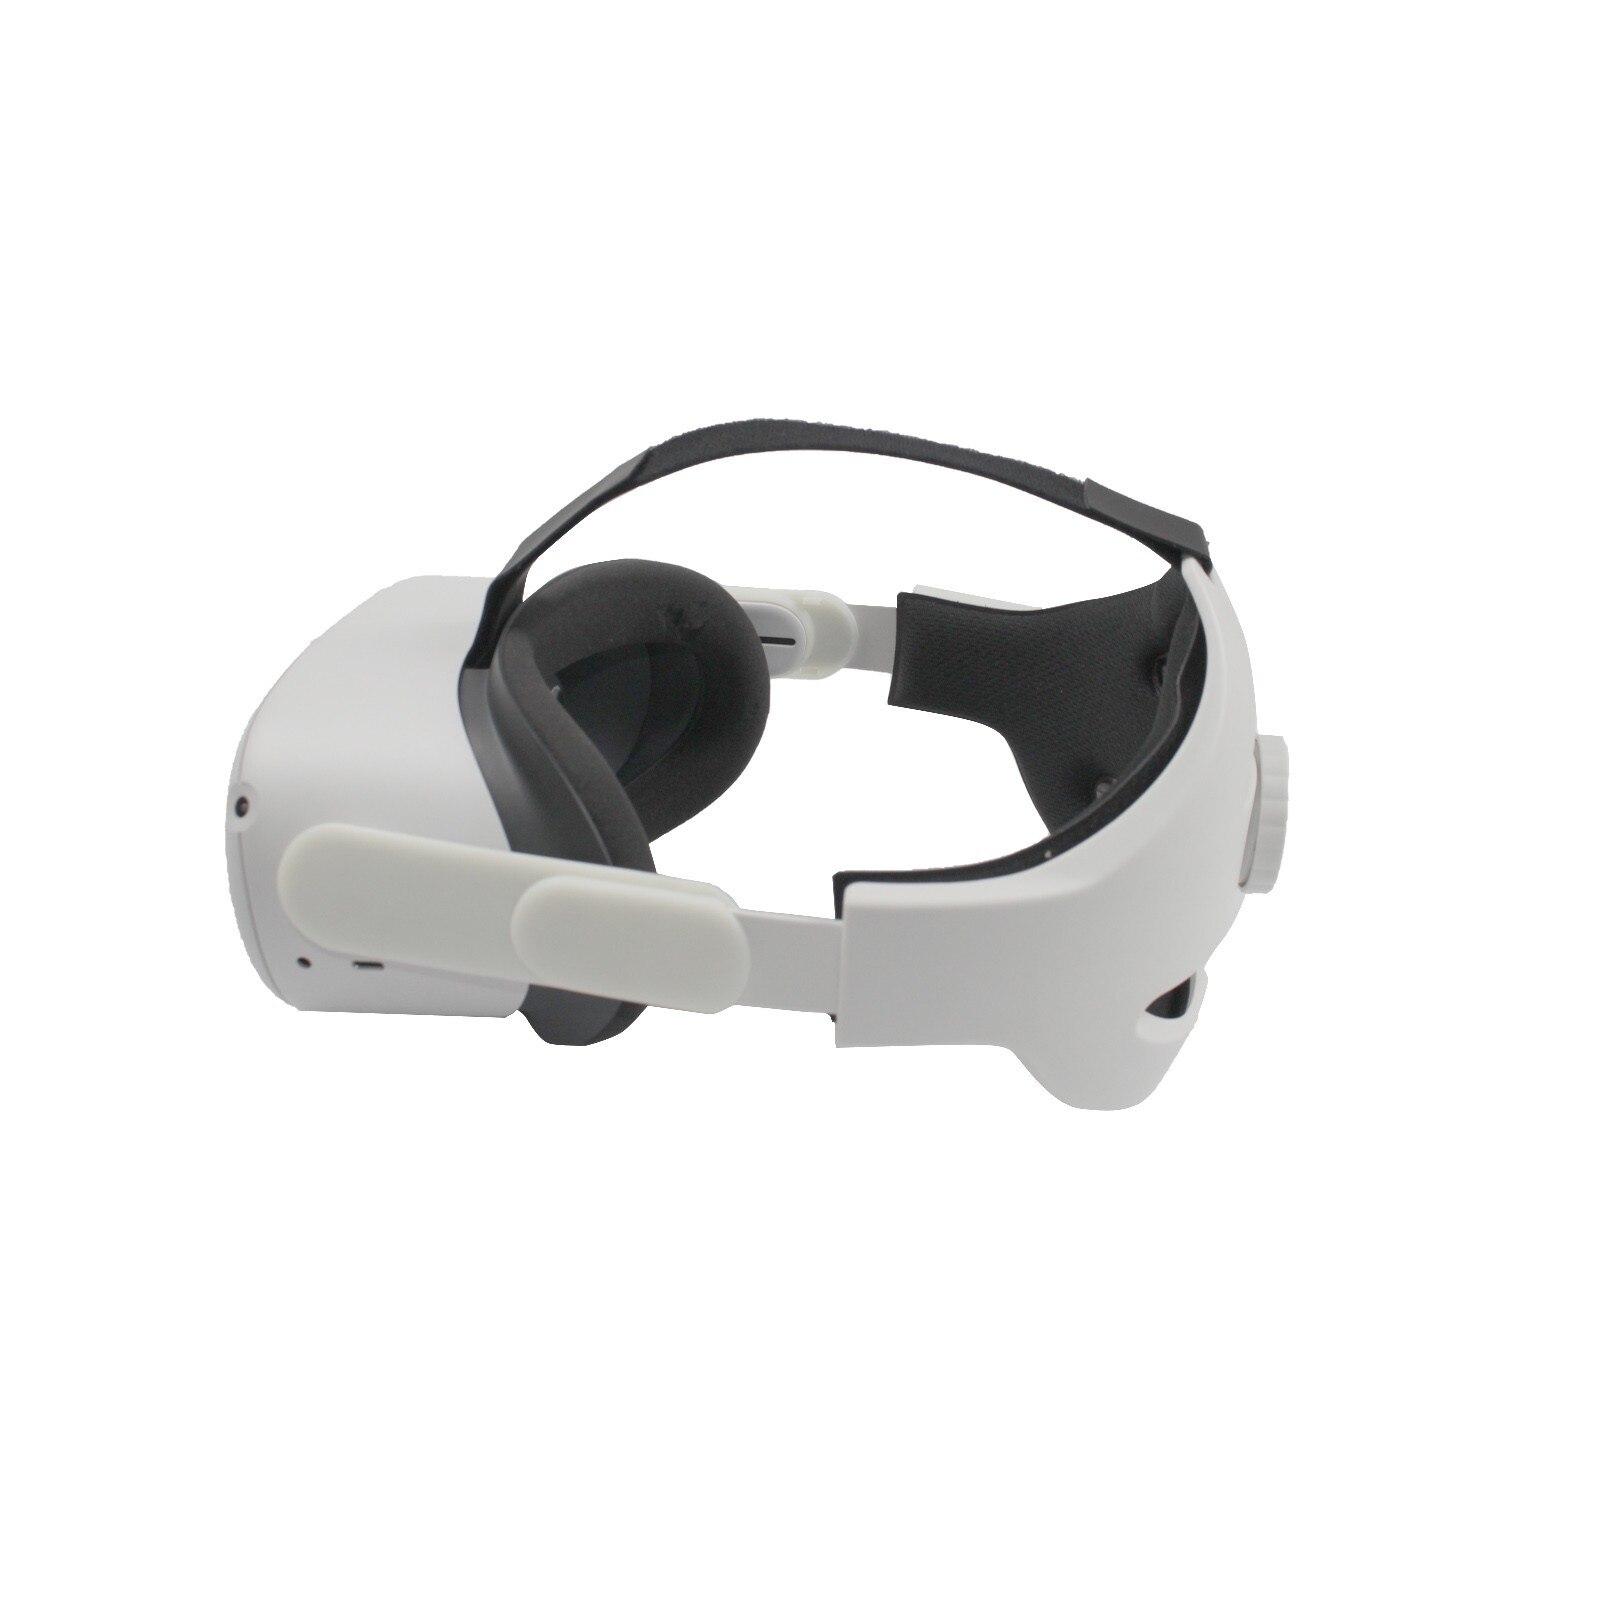 Cheap Acessórios de óculos VRAR